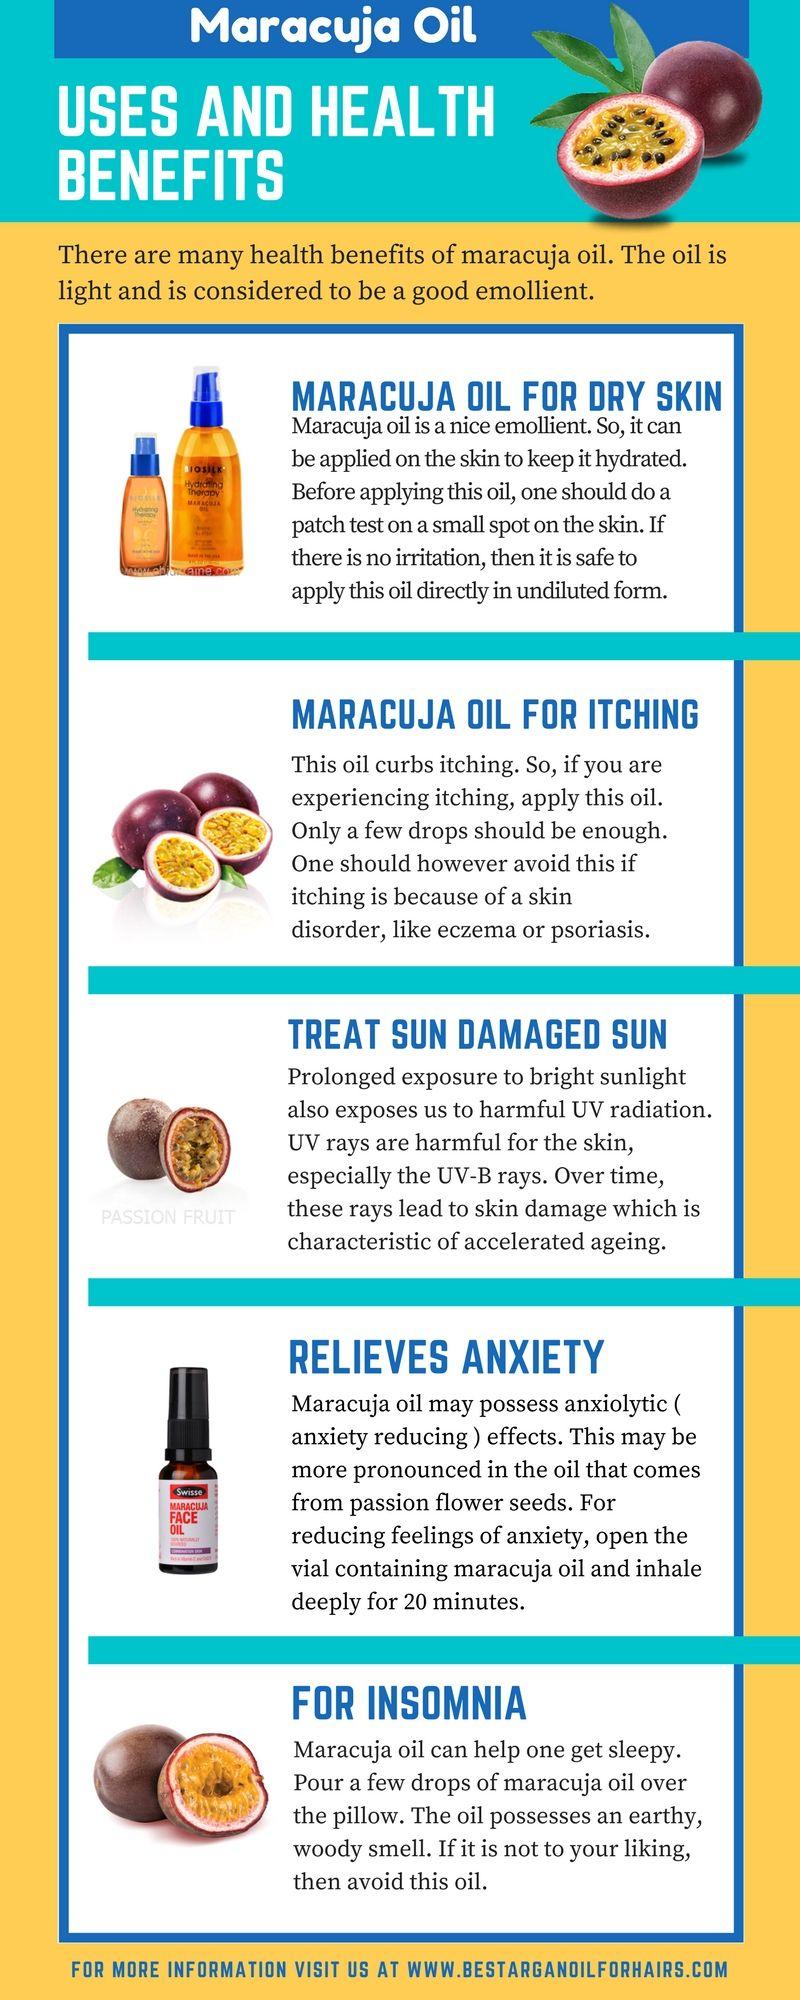 Best 5 Benefits Of Maracujaoil Https Www Bestarganoilforhairs Com 2017 03 Maracuja Oil Vs Argan Oil Maracuja Oil Oil For Dry Skin Maracuja Oil Benefits